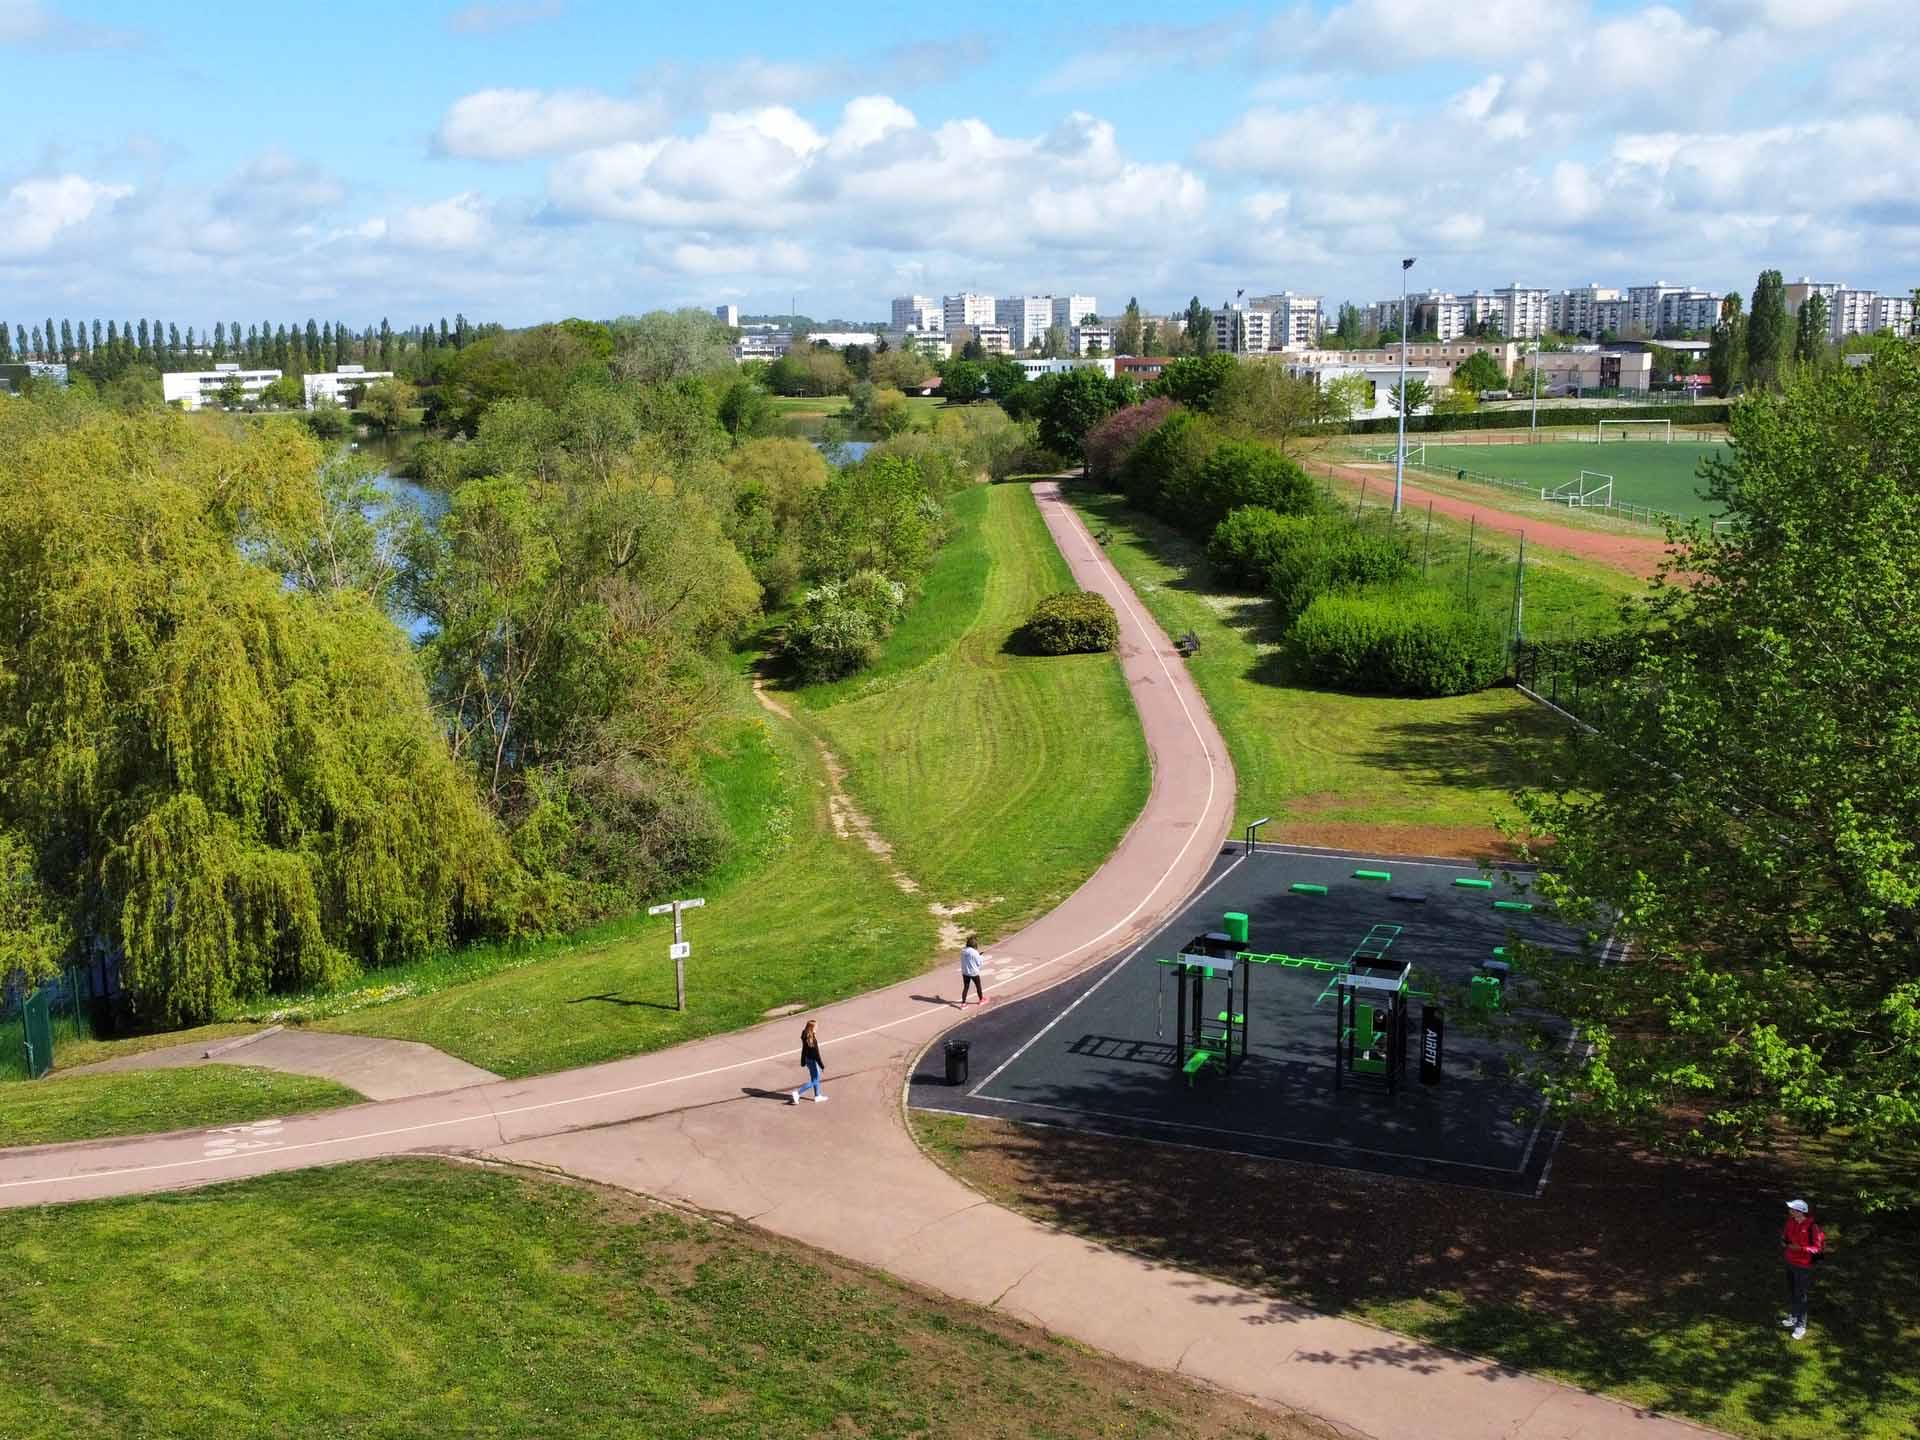 Photo du lac Symphonie à Metz avec un plateau sportif plein air en premier plan